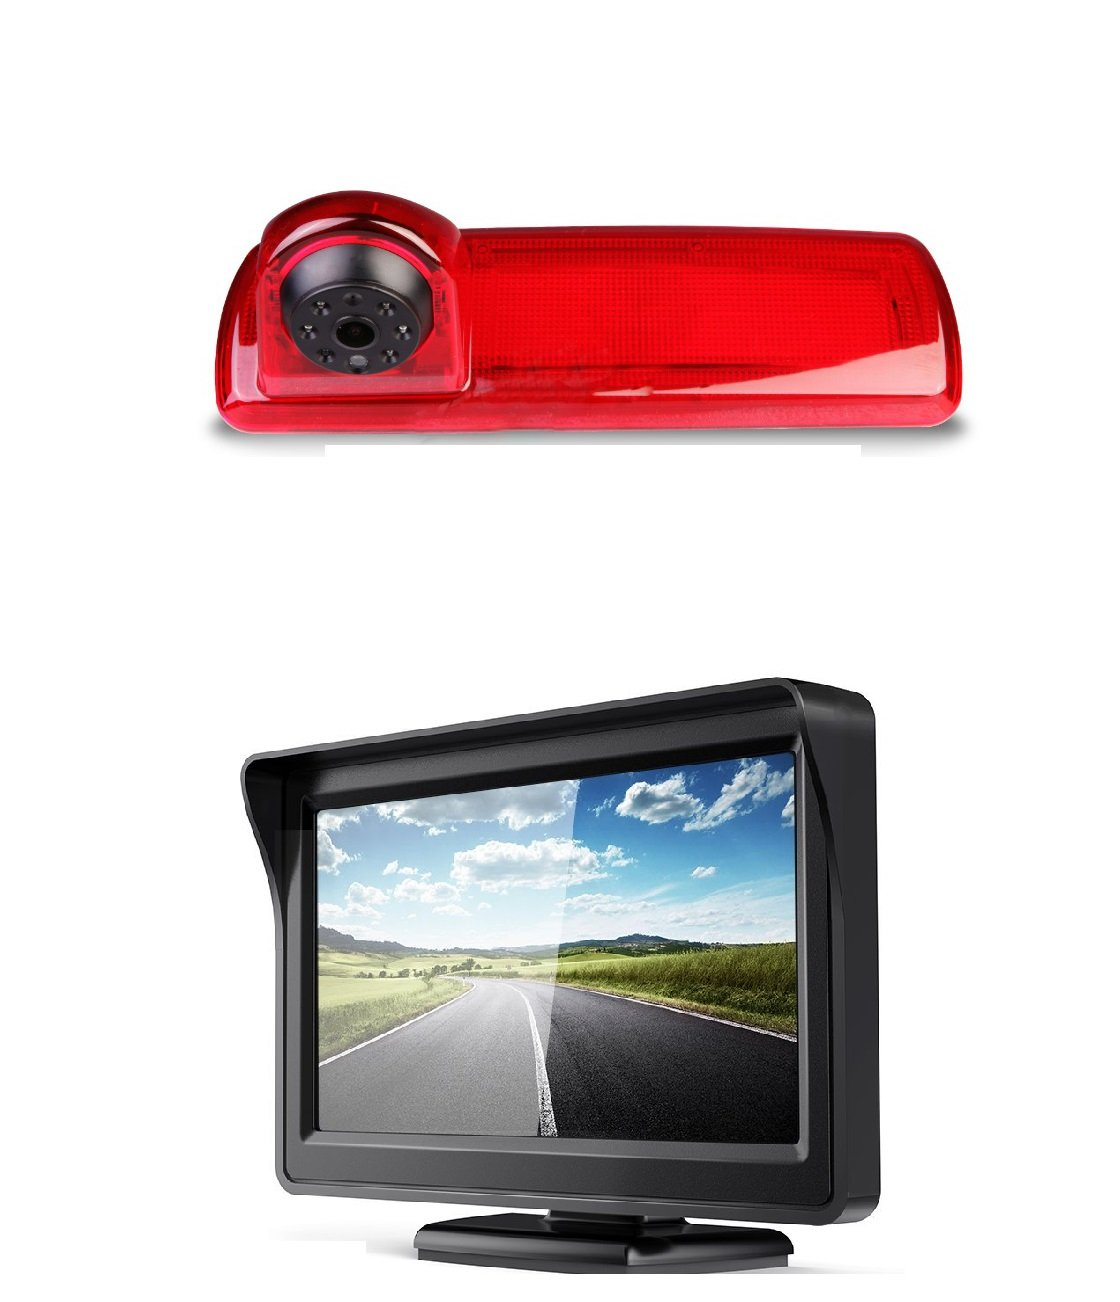 Auto-Dritte-Dach-Top-Mount-Bremsleuchte-Kamera-Bremslicht-Rckfahrkamera-Monitor-Set-fr-Opel-Vivaro-B-Renault-Trafic-X82-NV300-ab-2014-43-Zoll-DVD-Monitor-TFT-Bildschirm-LKW-KFZ-LCD-Display